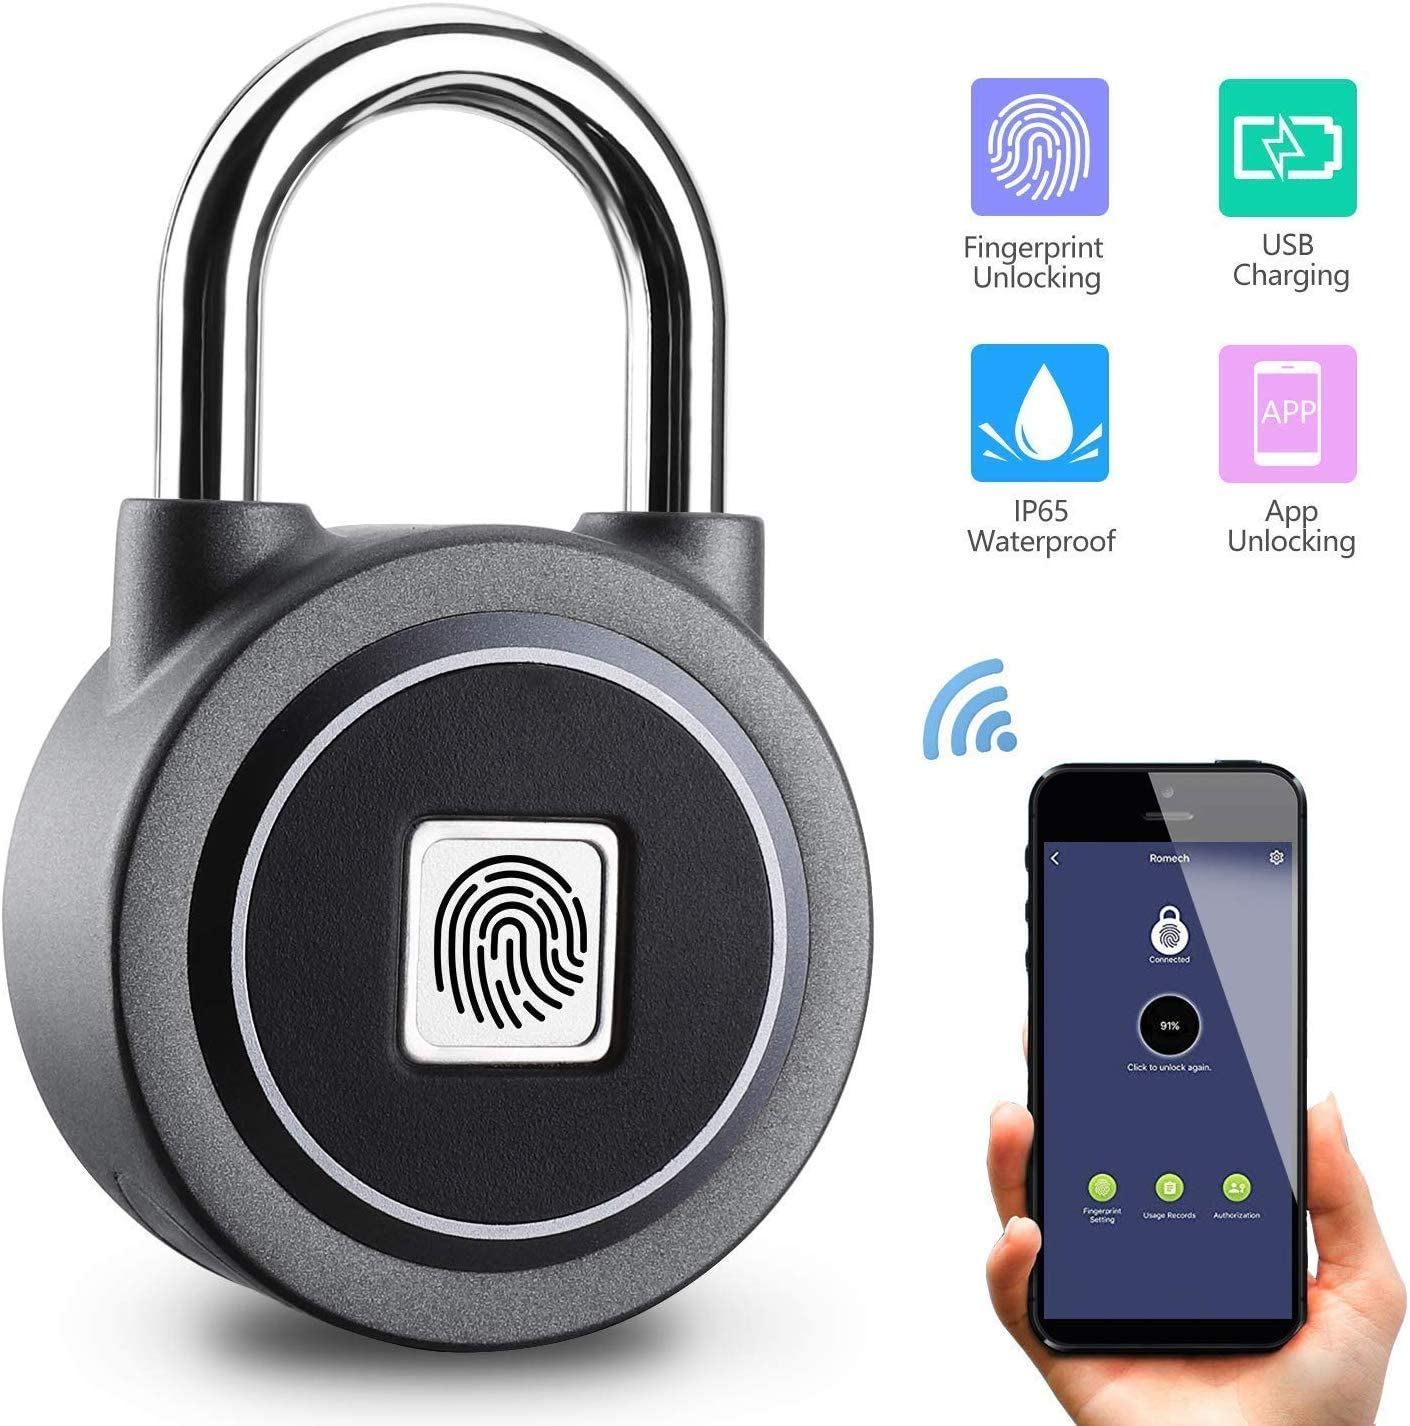 SHANG-JUNS Easy Installation Fingerprint Lock Security USB Charging Door Lock Smart Padlock Black Alloy Steel Stainless Steel Color : Black